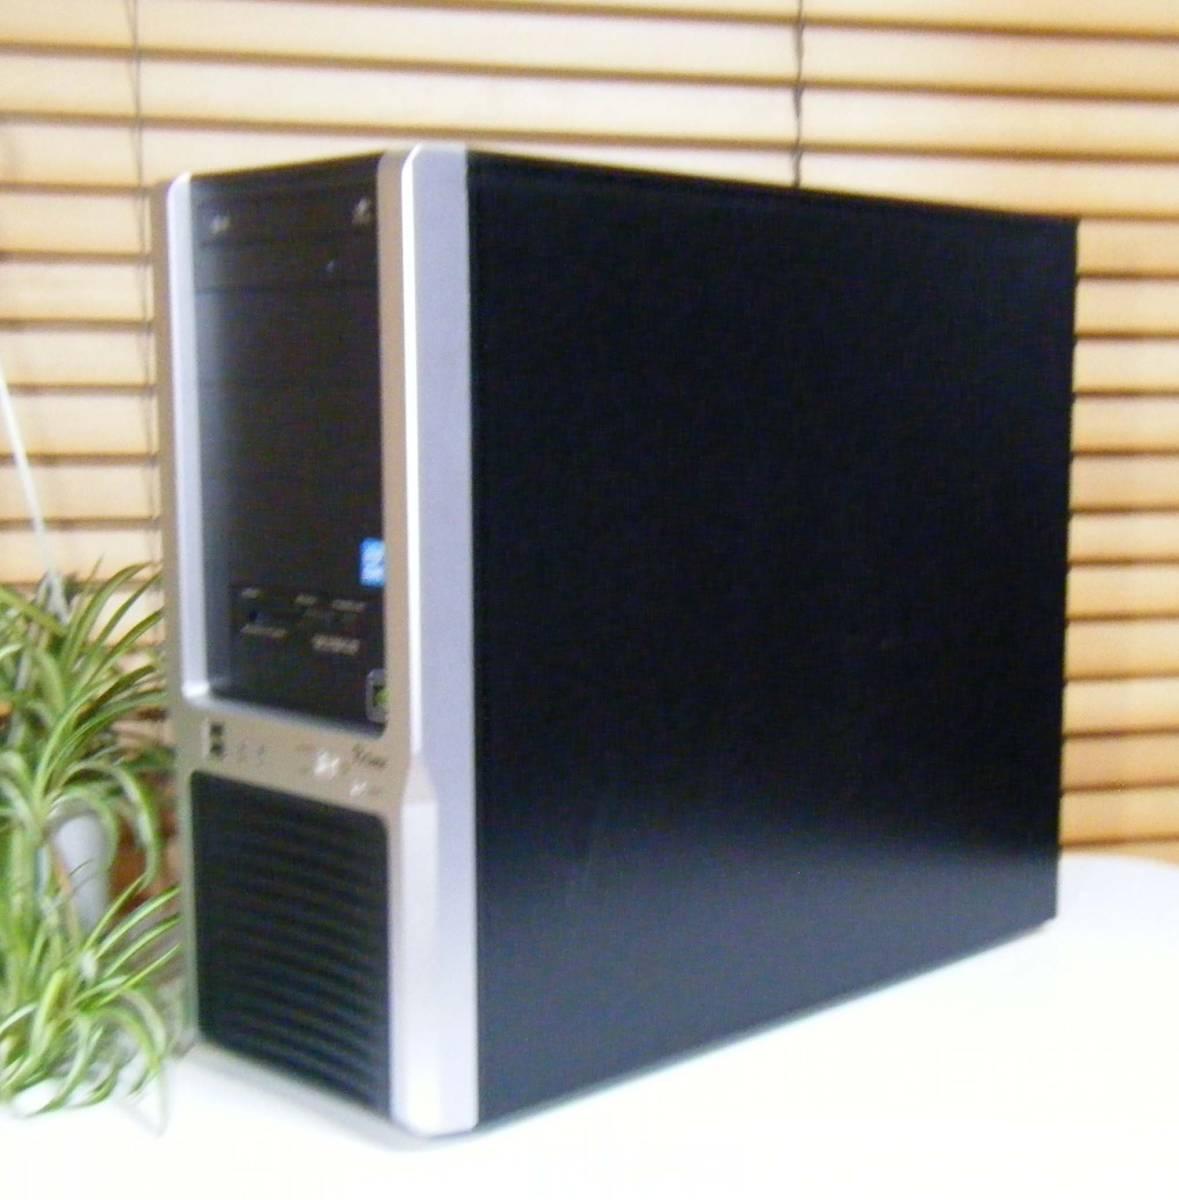 ◆ 秒速/i7 920/自作Prime X58/新品SSD 160GB/HDD 1TB/Office2016/Win10キー付 ◆_画像2